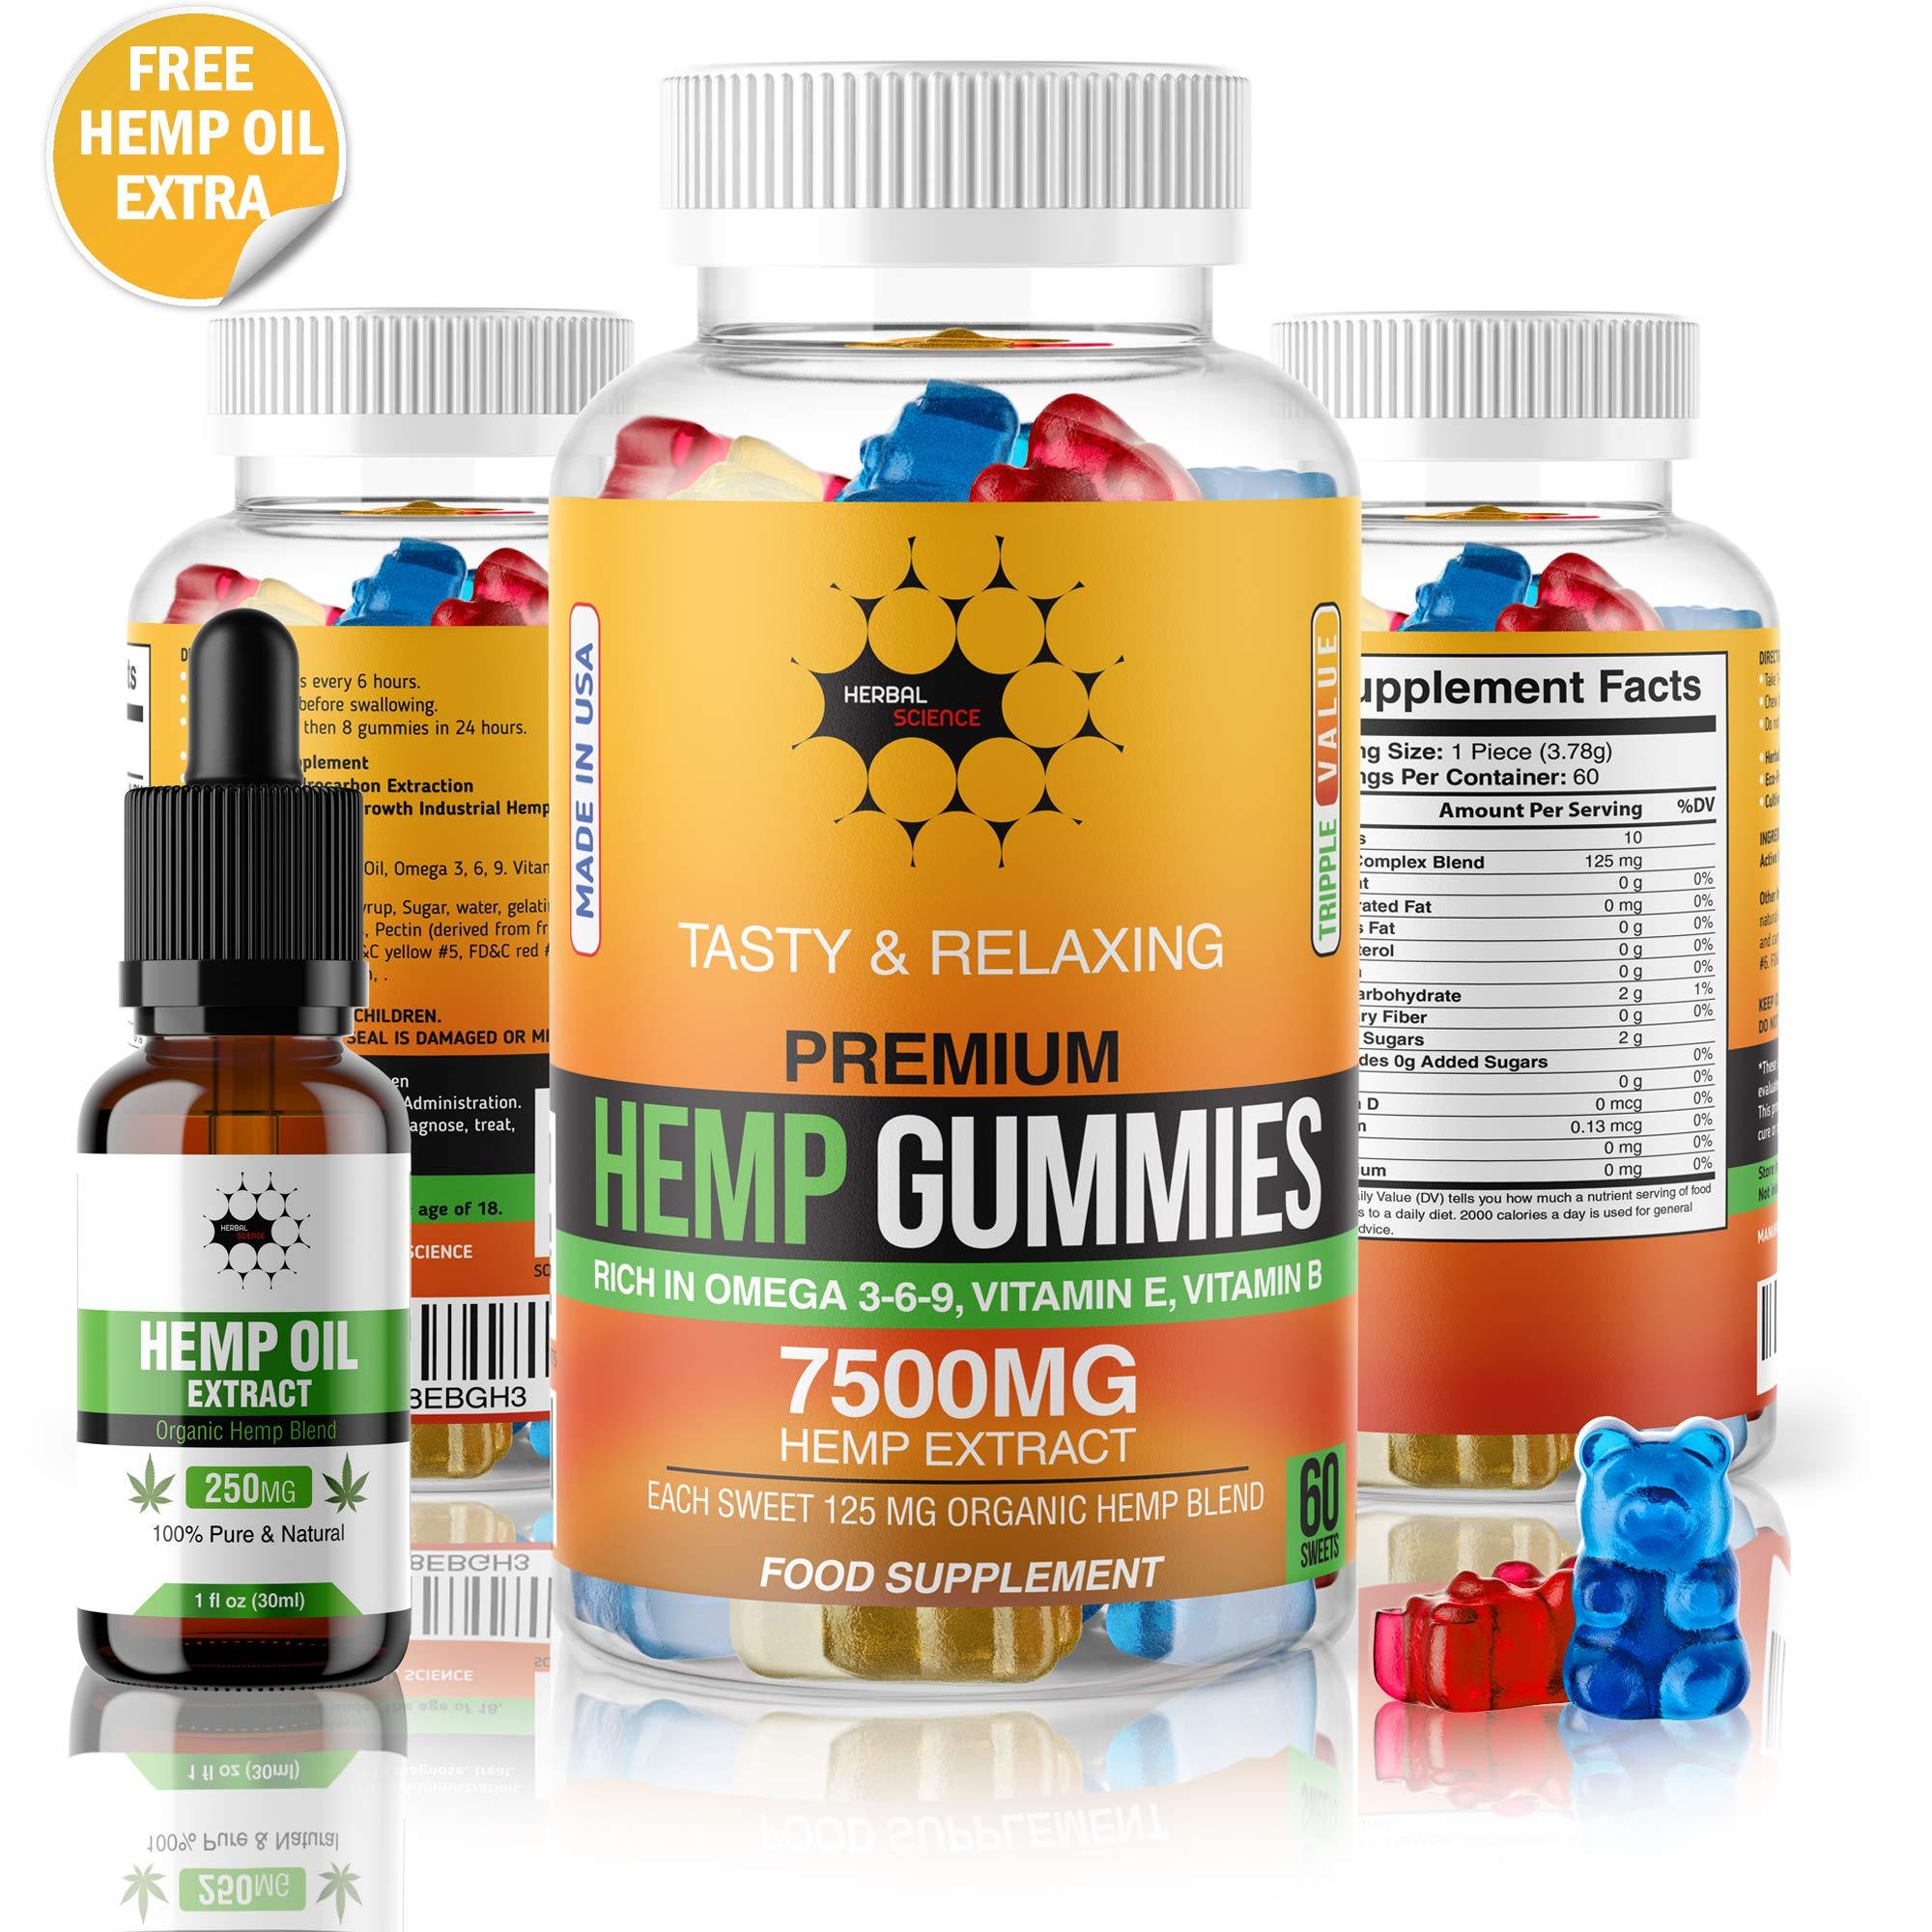 Herbal Science Premium Hemp Gummies: 7500mg Natural Hemp Extract Candy Supplement for Pain, Anxiety, Sleep, Stress, Memory, Mood - 60 Fruity Gummy Bears and 250mg Hemp Oil Extract Drops